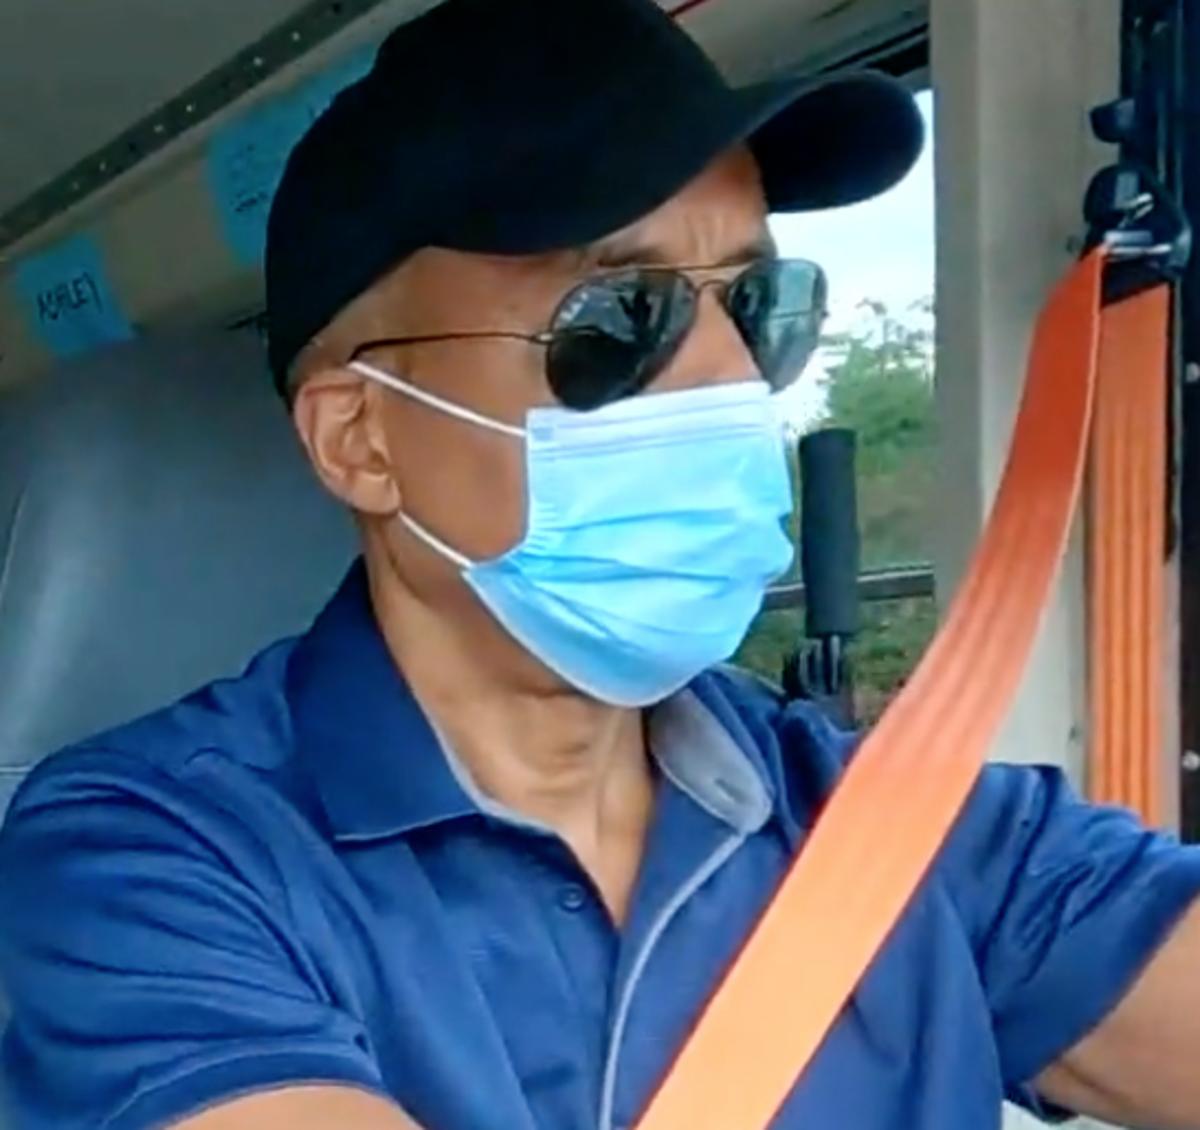 Former top FBI official starts new job driving a school bus